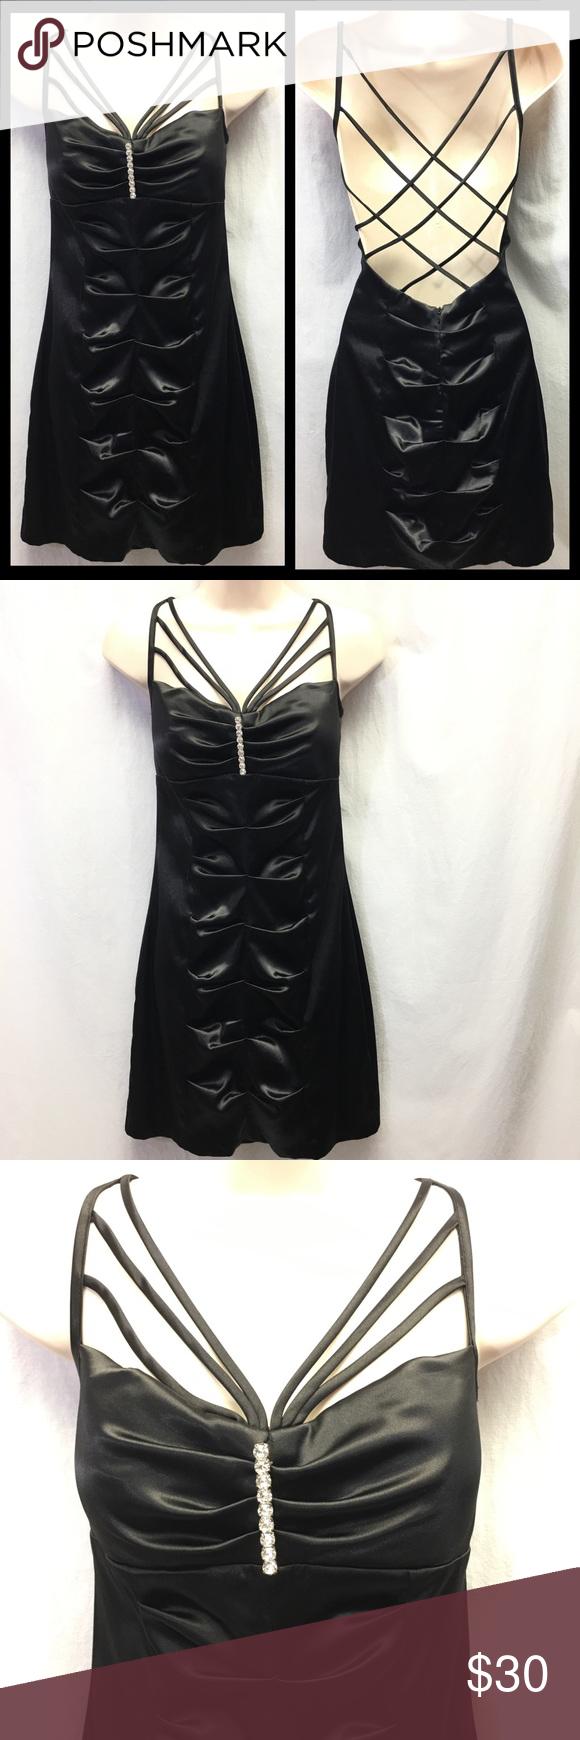 B smart black ruched dress juniors size shop my poshmark